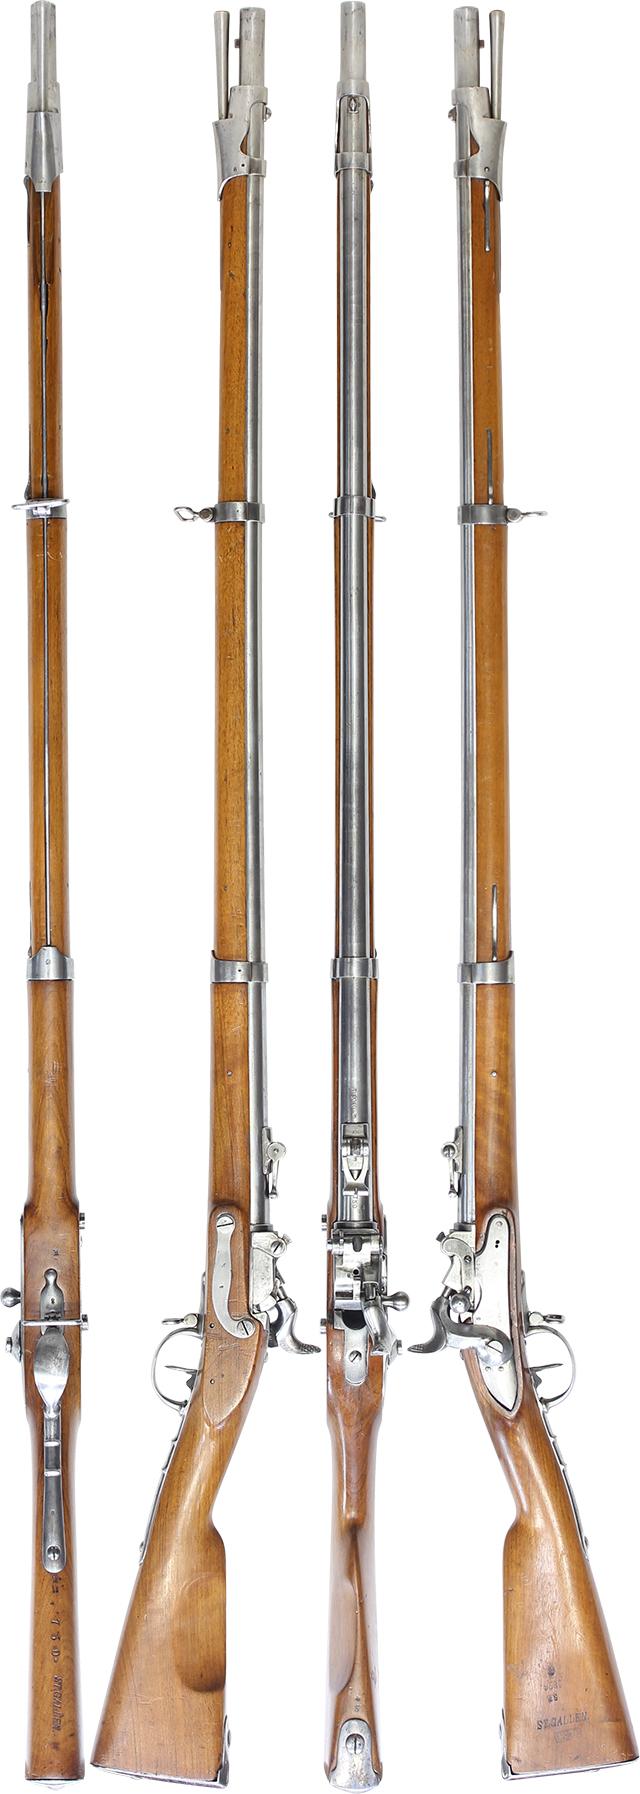 【5254】スイス M1817-42-59-67 後装式歩兵銃 (無可動古式銃、#8516).jpg